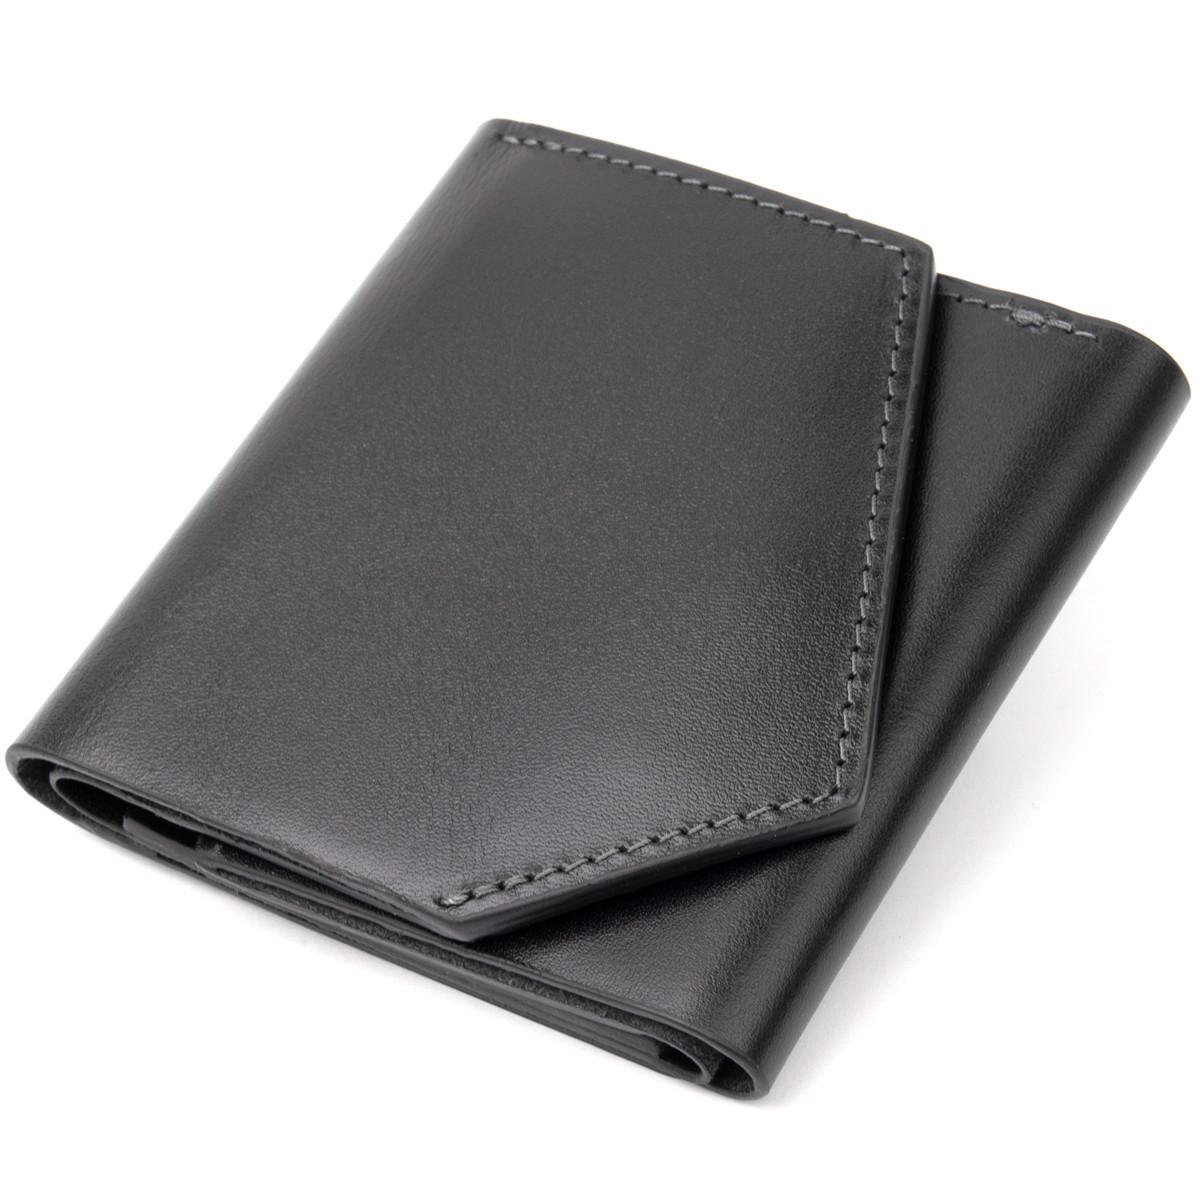 Портмоне карманное 11336 Grande Pelle Черное